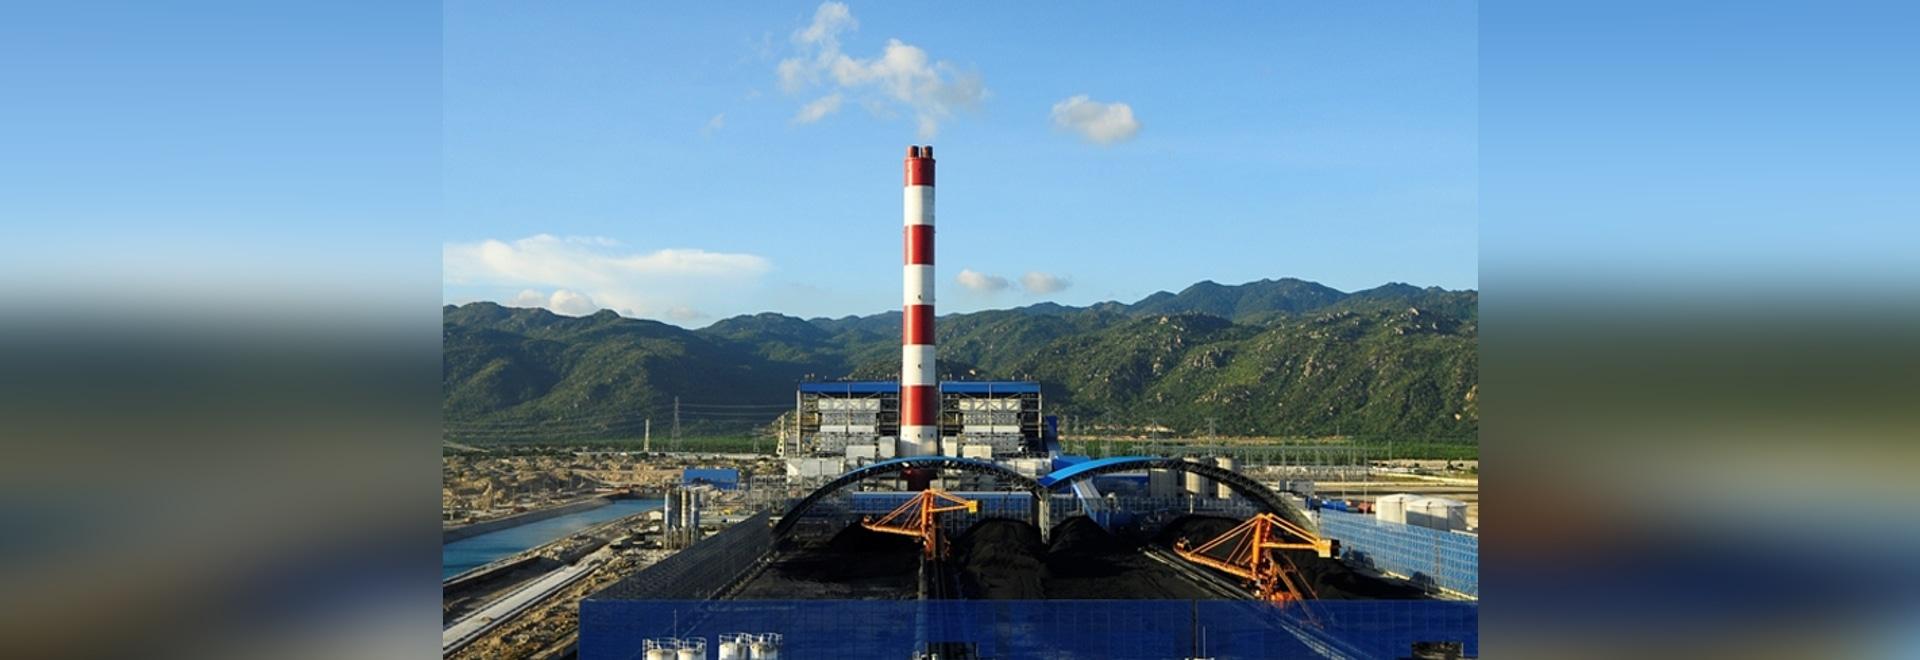 Proyecto del BOT de Vietnam Vinh Tan Power Plant